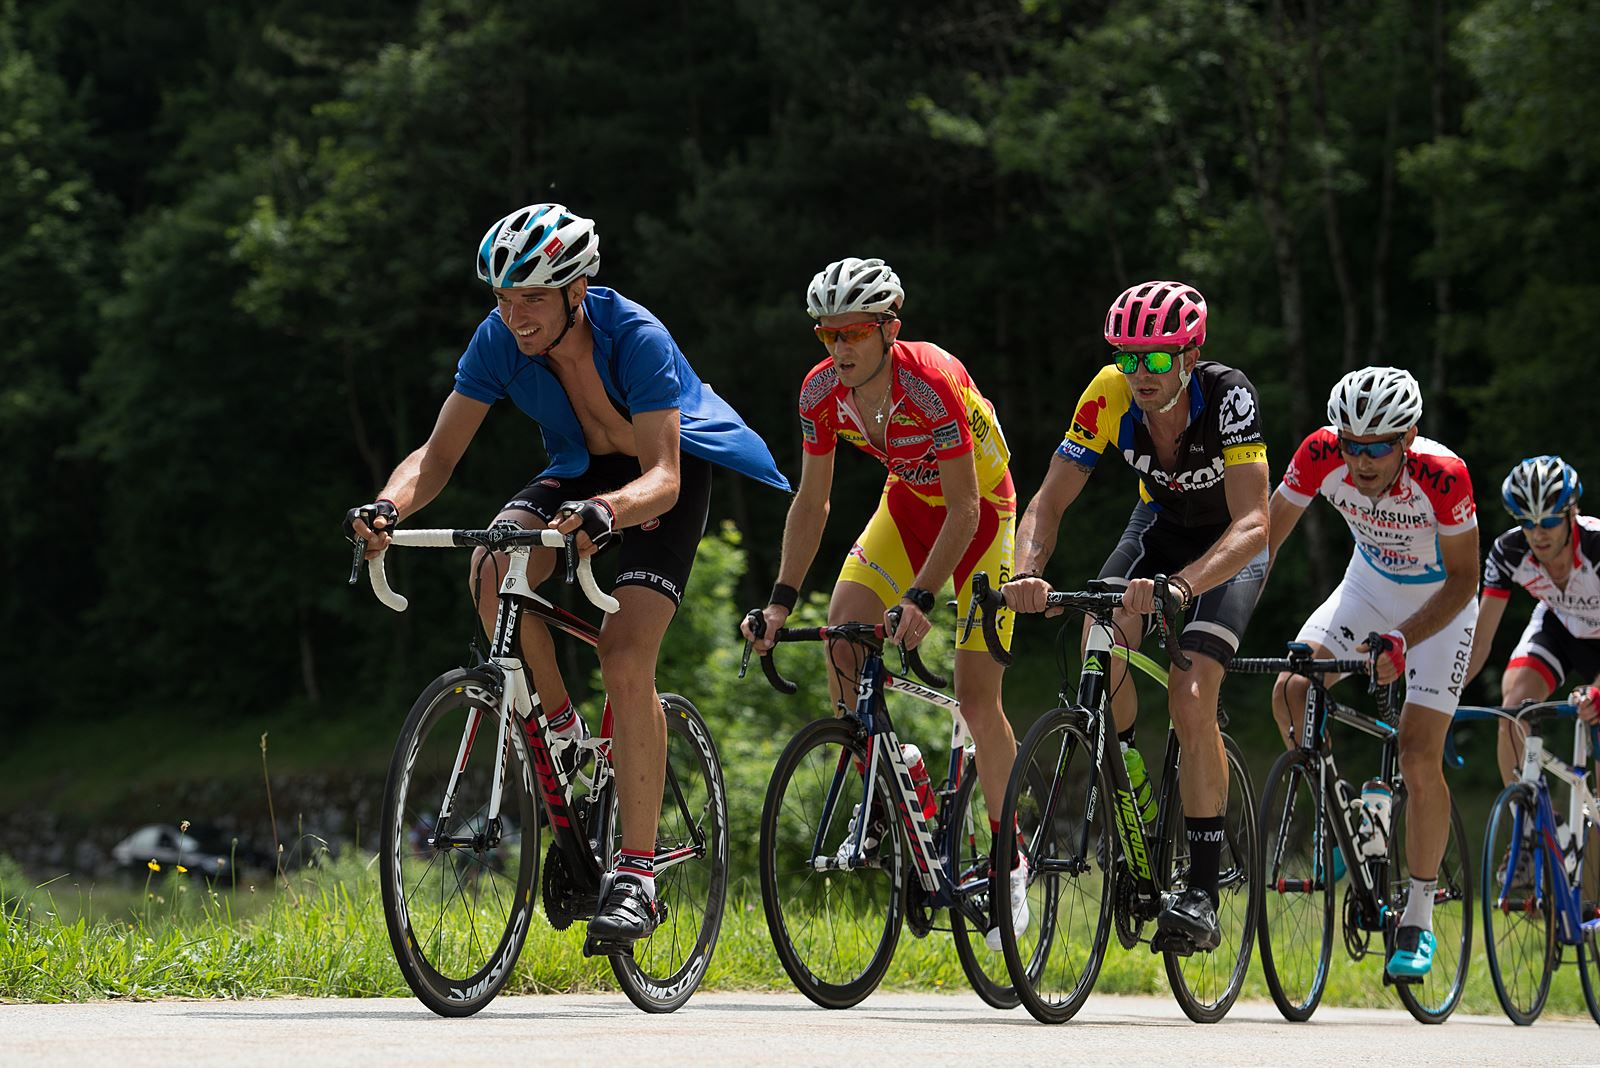 Photographe Cyclisme En Combe De Savoie : Sur Une Course Cyclo En Savoie